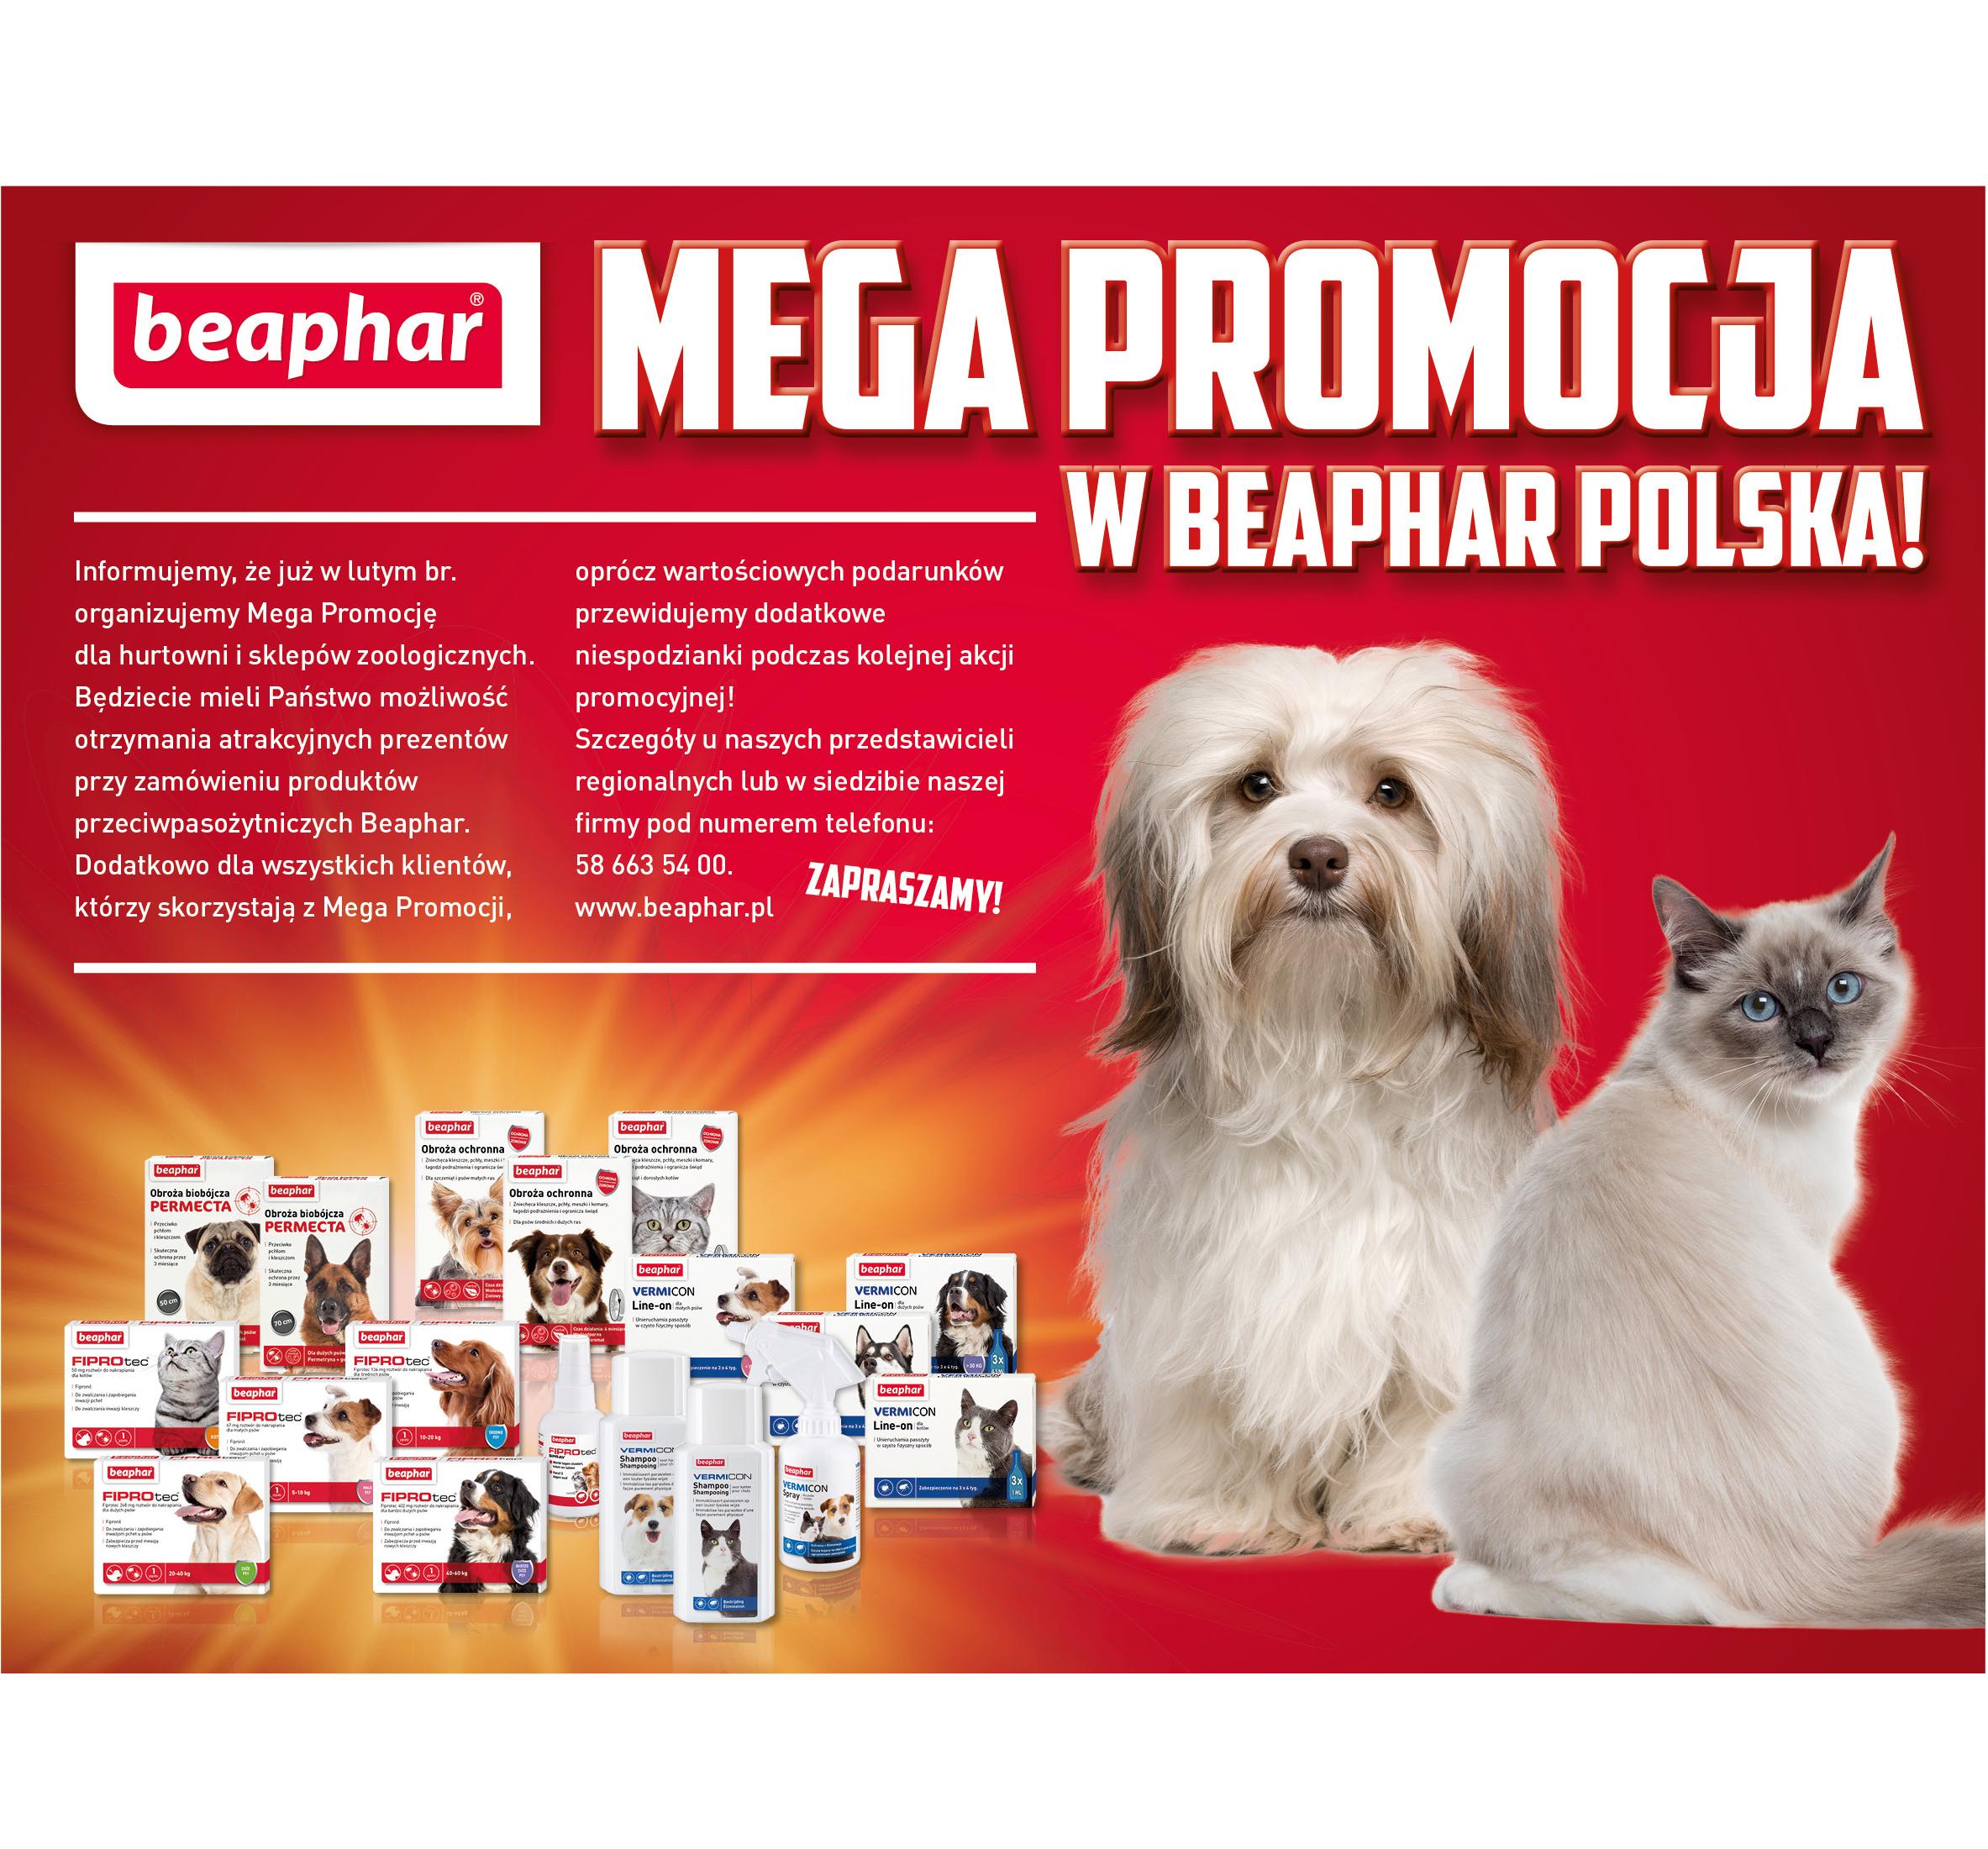 Mega promocja w Beaphar Polska!